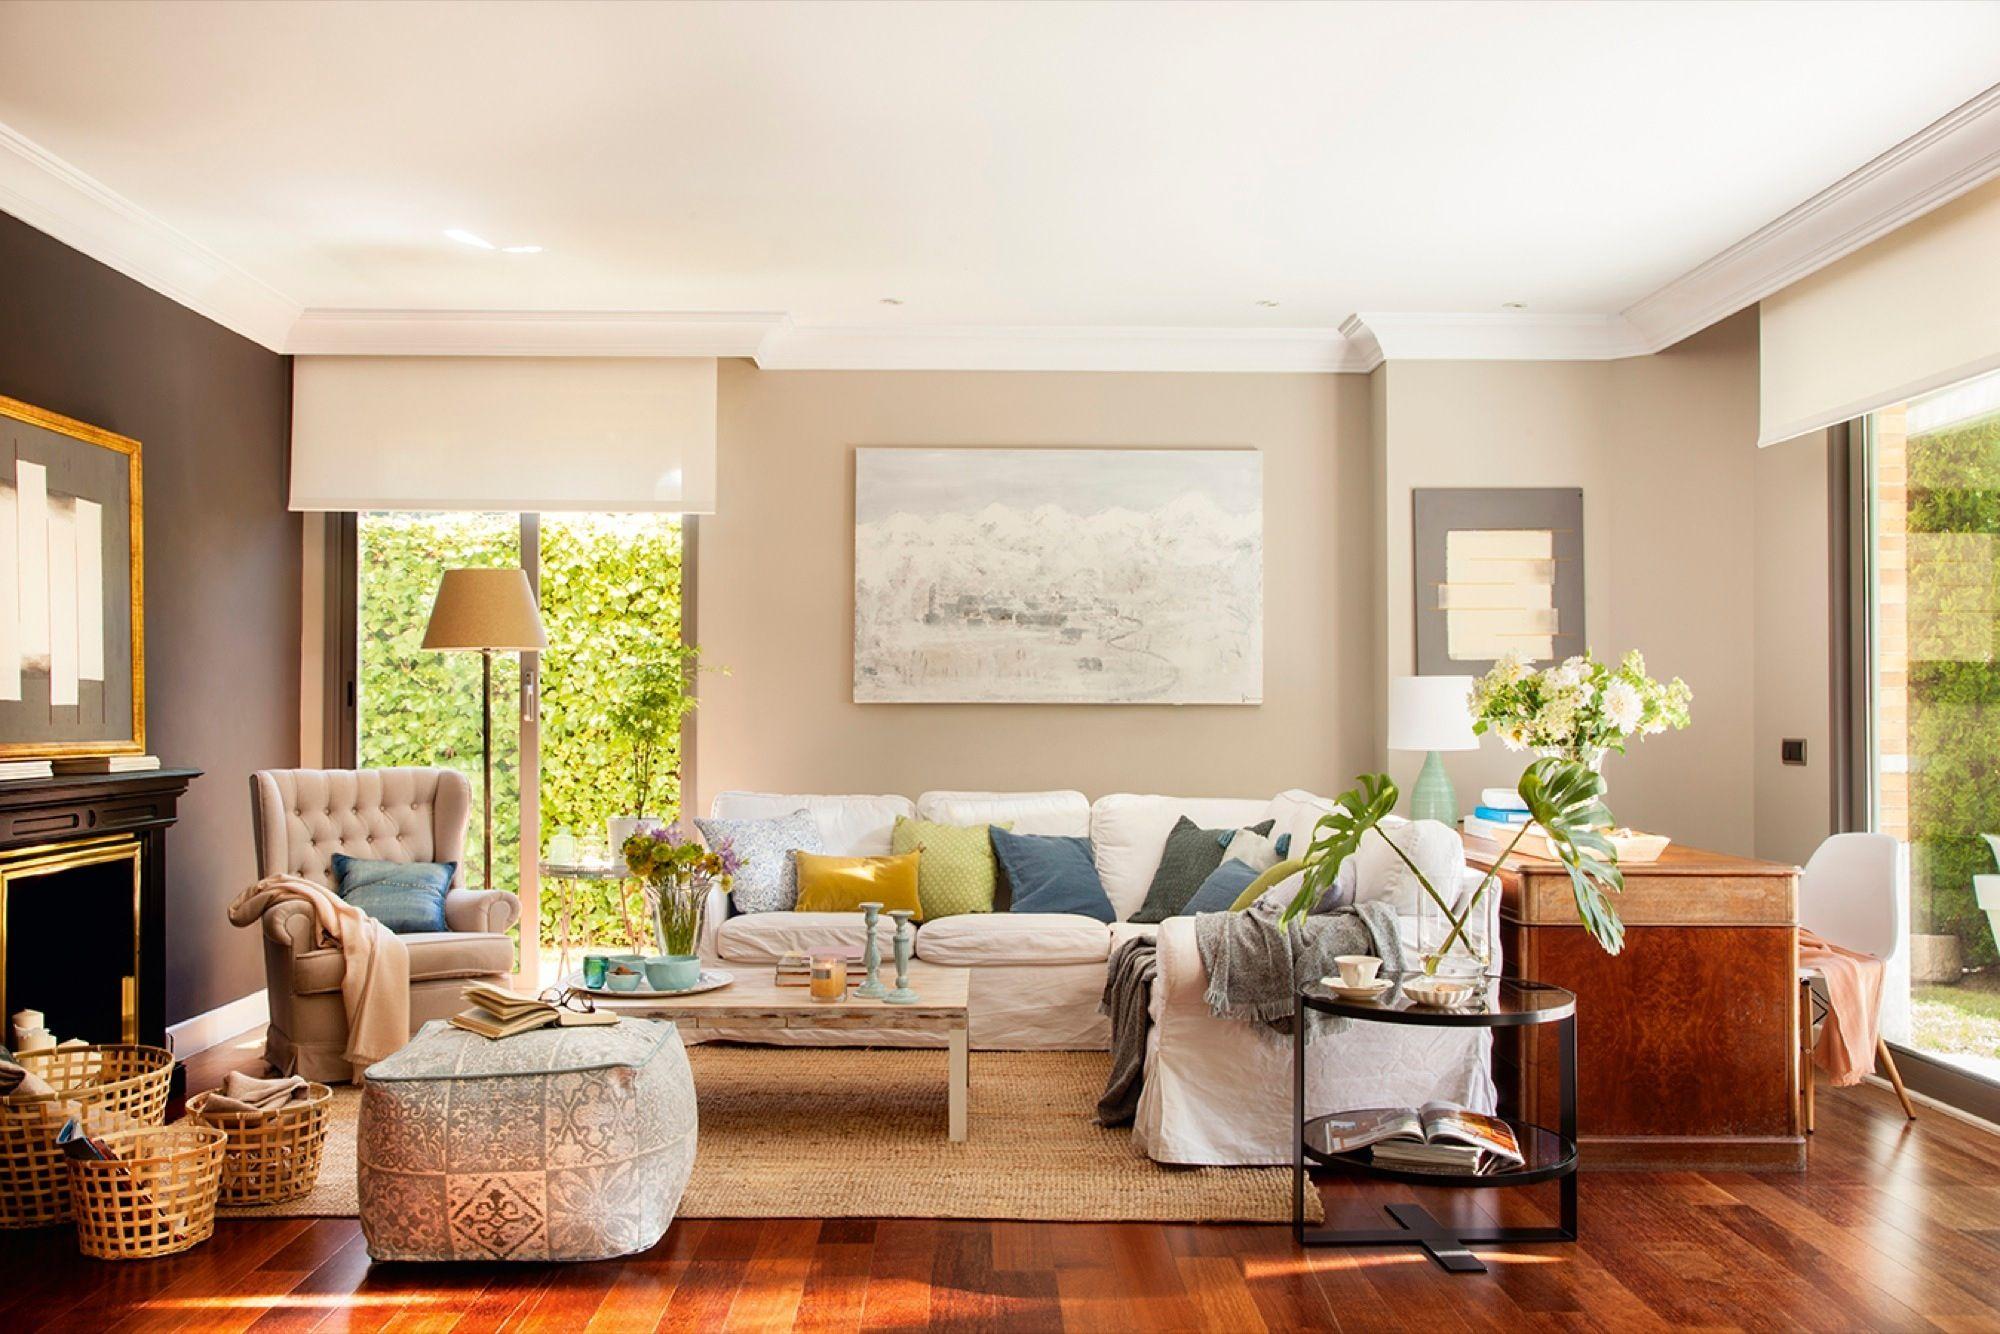 Salón pintado en tonos tierra | Pinterest | Pintar la casa ...